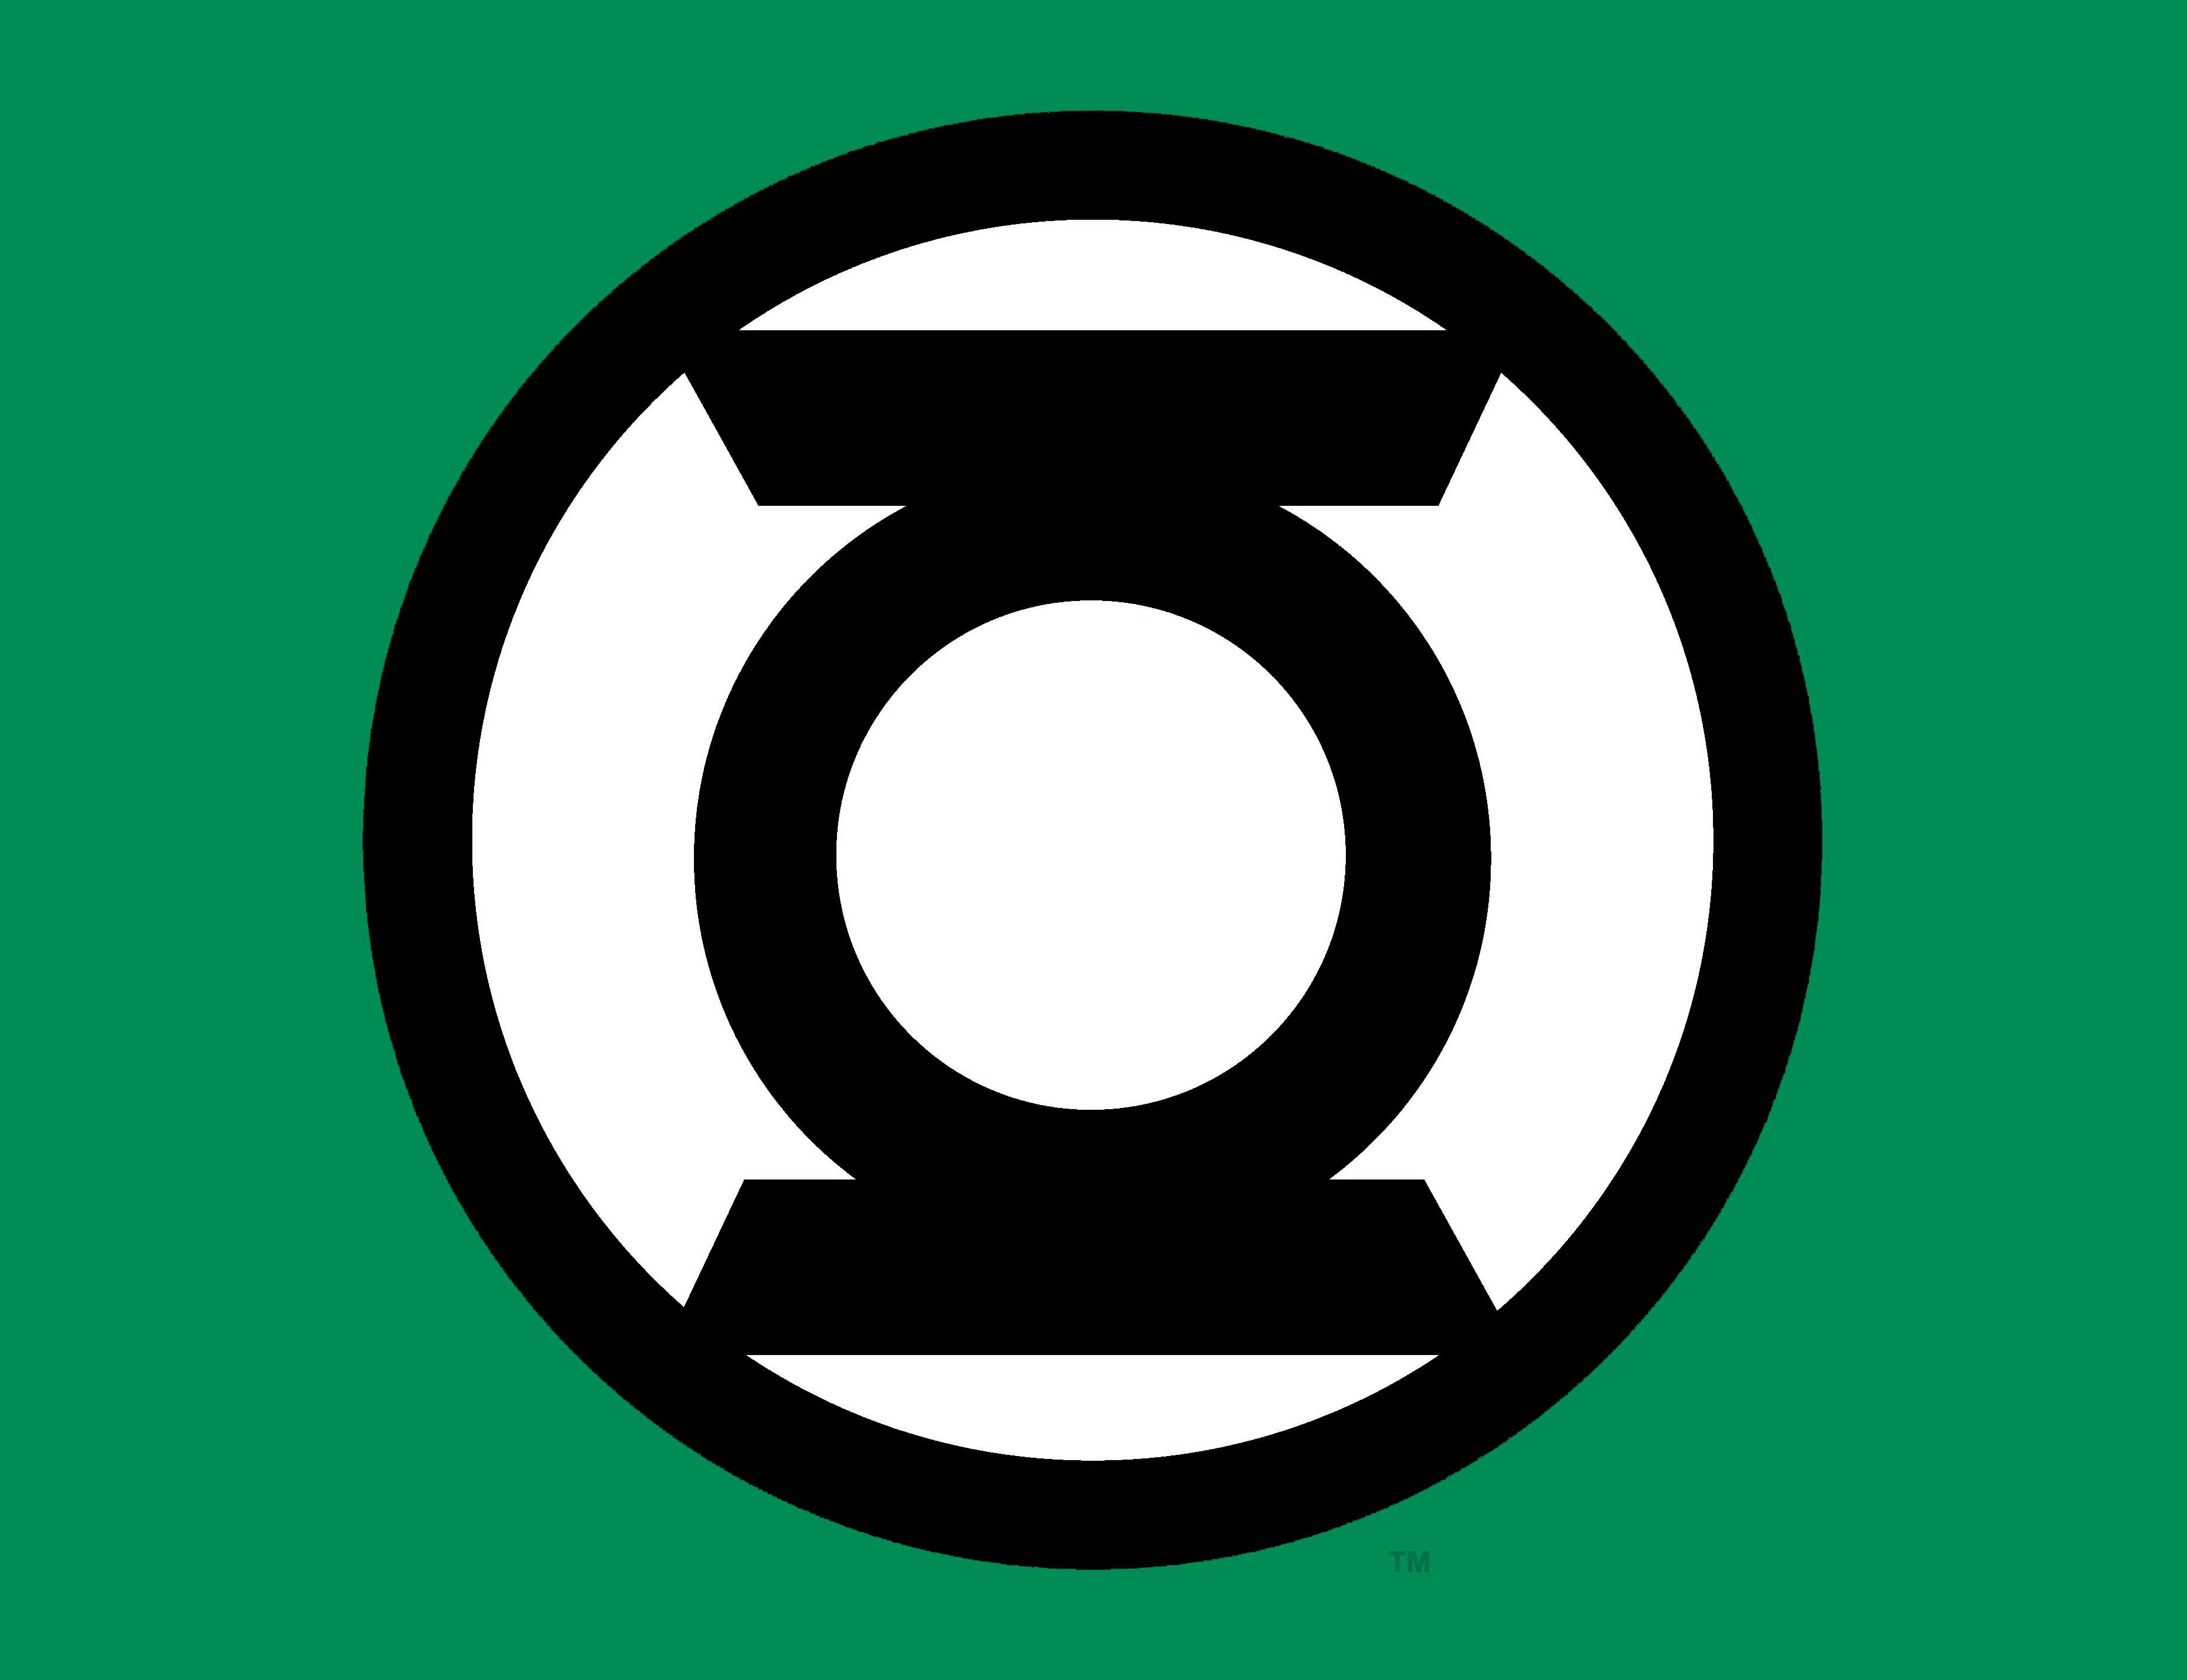 Green Lantern Logo, Green Lantern Symbol, Meaning, History ...